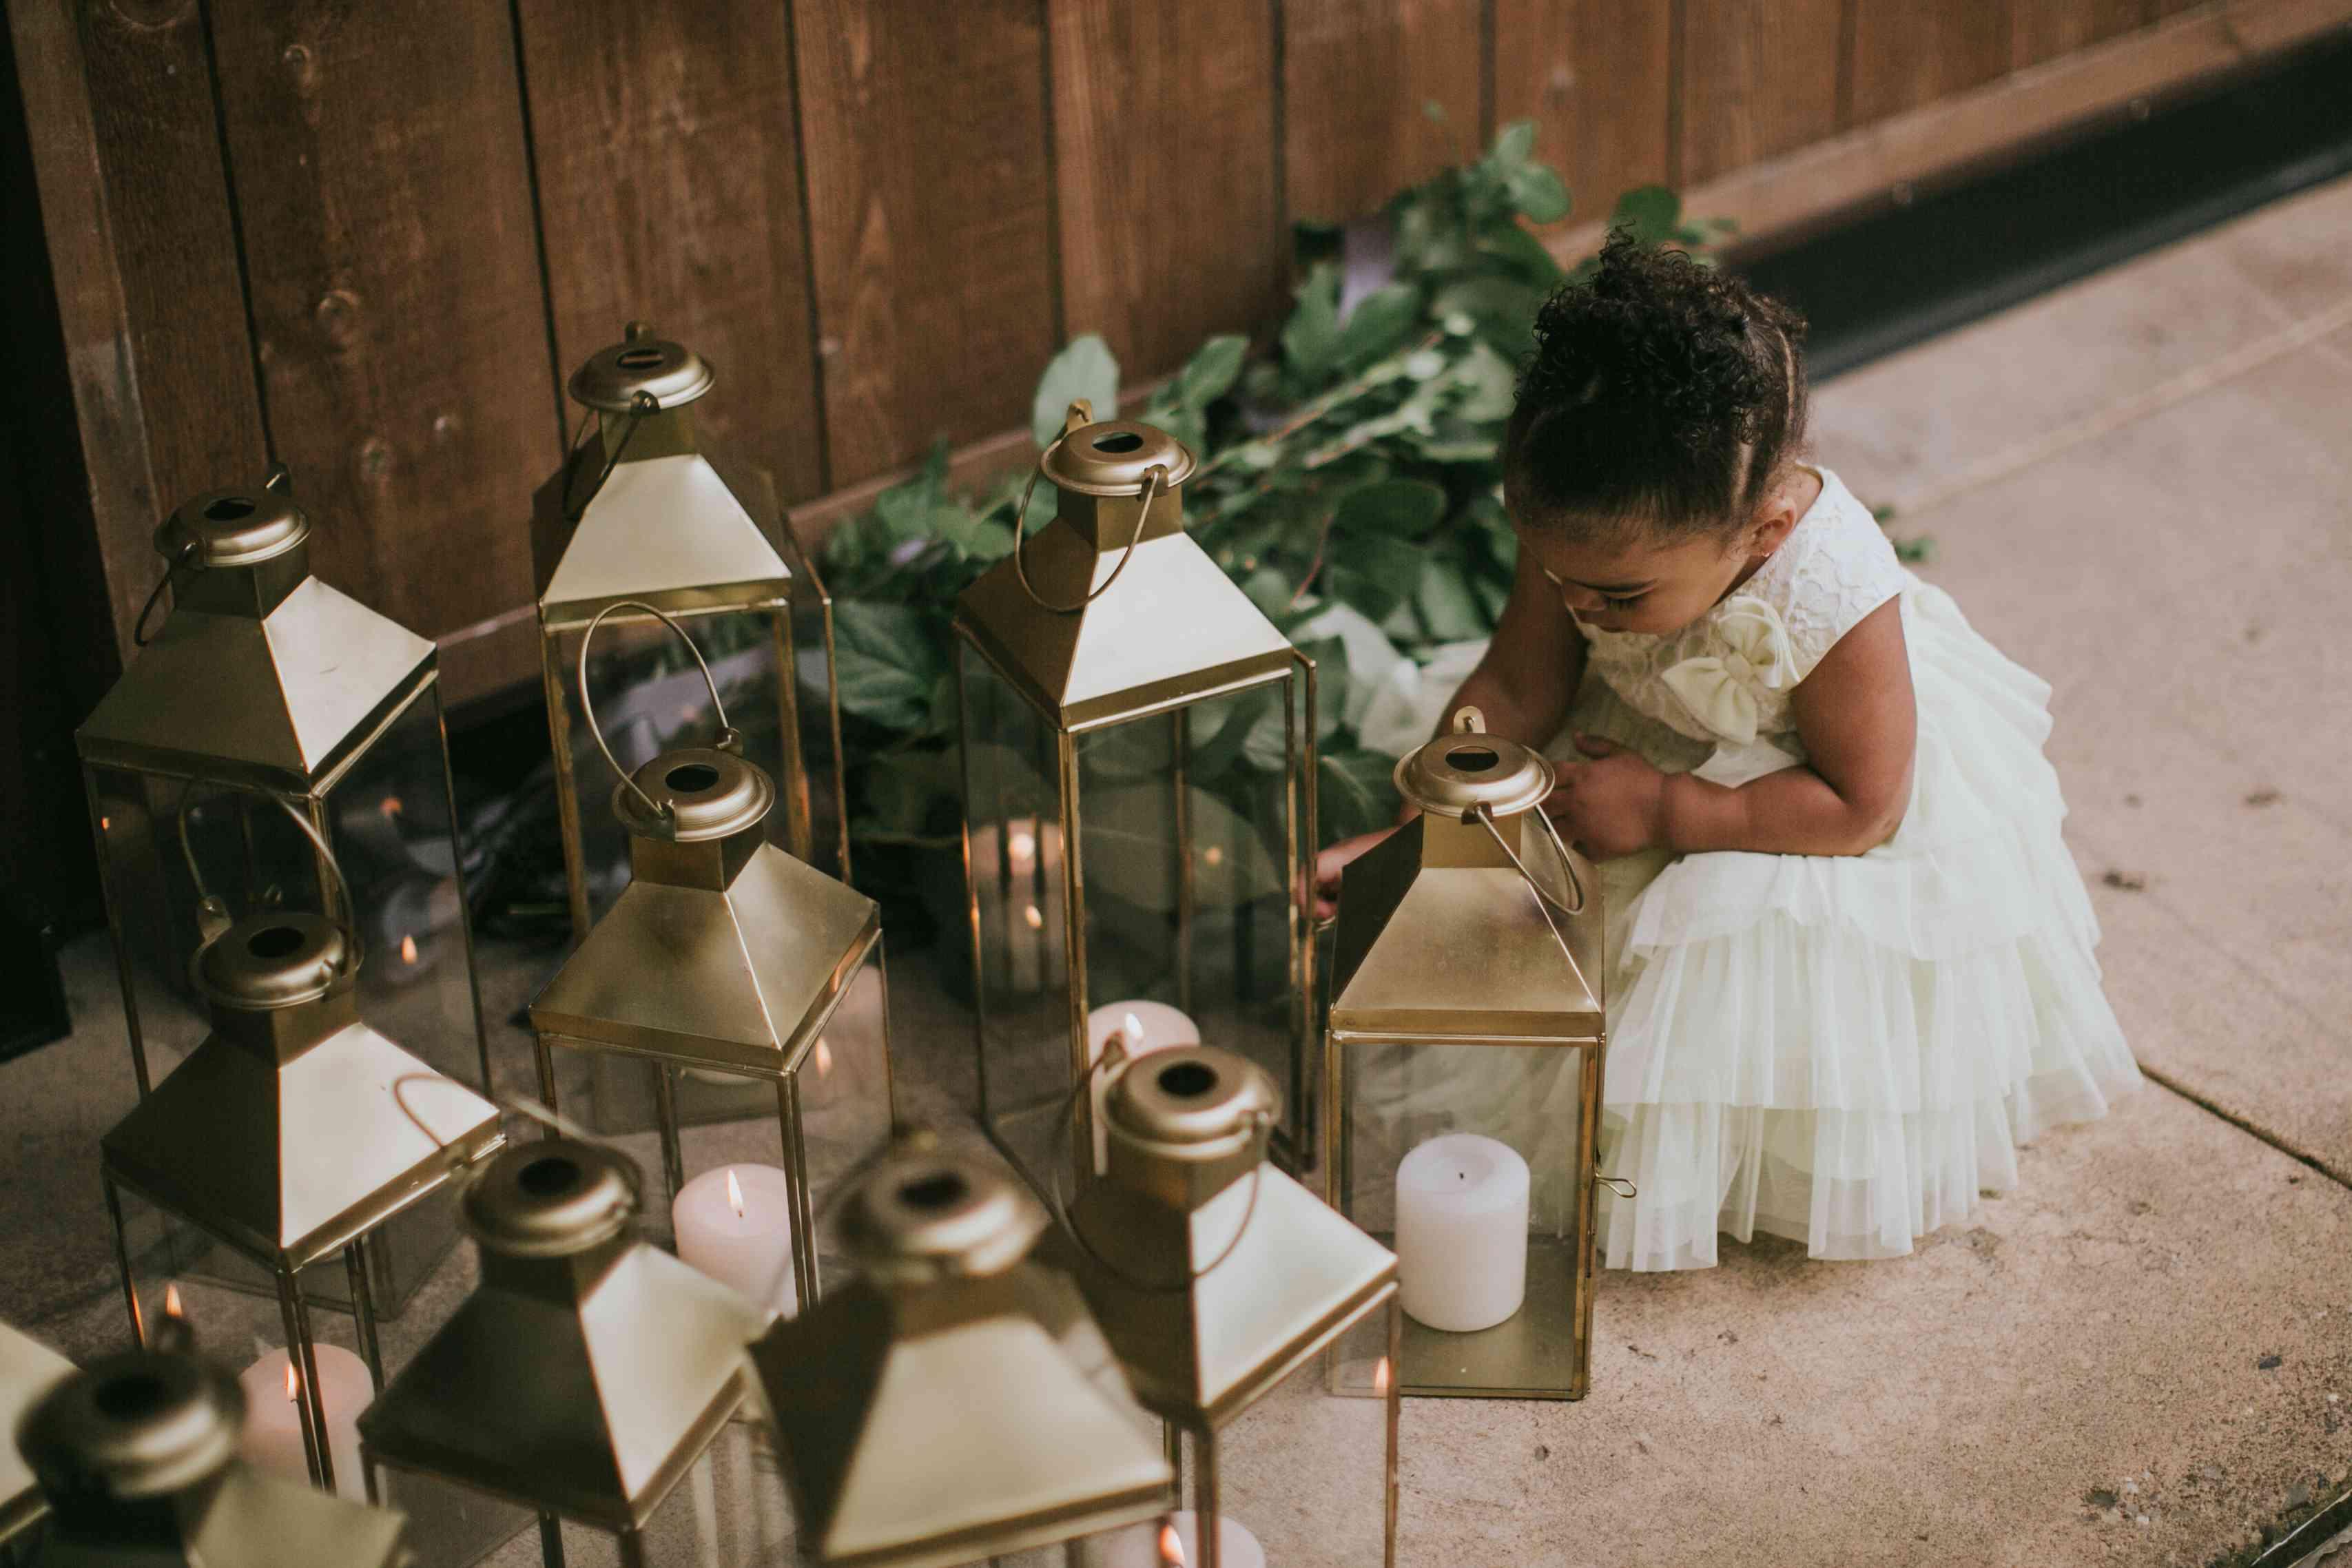 Flower girl by lanterns